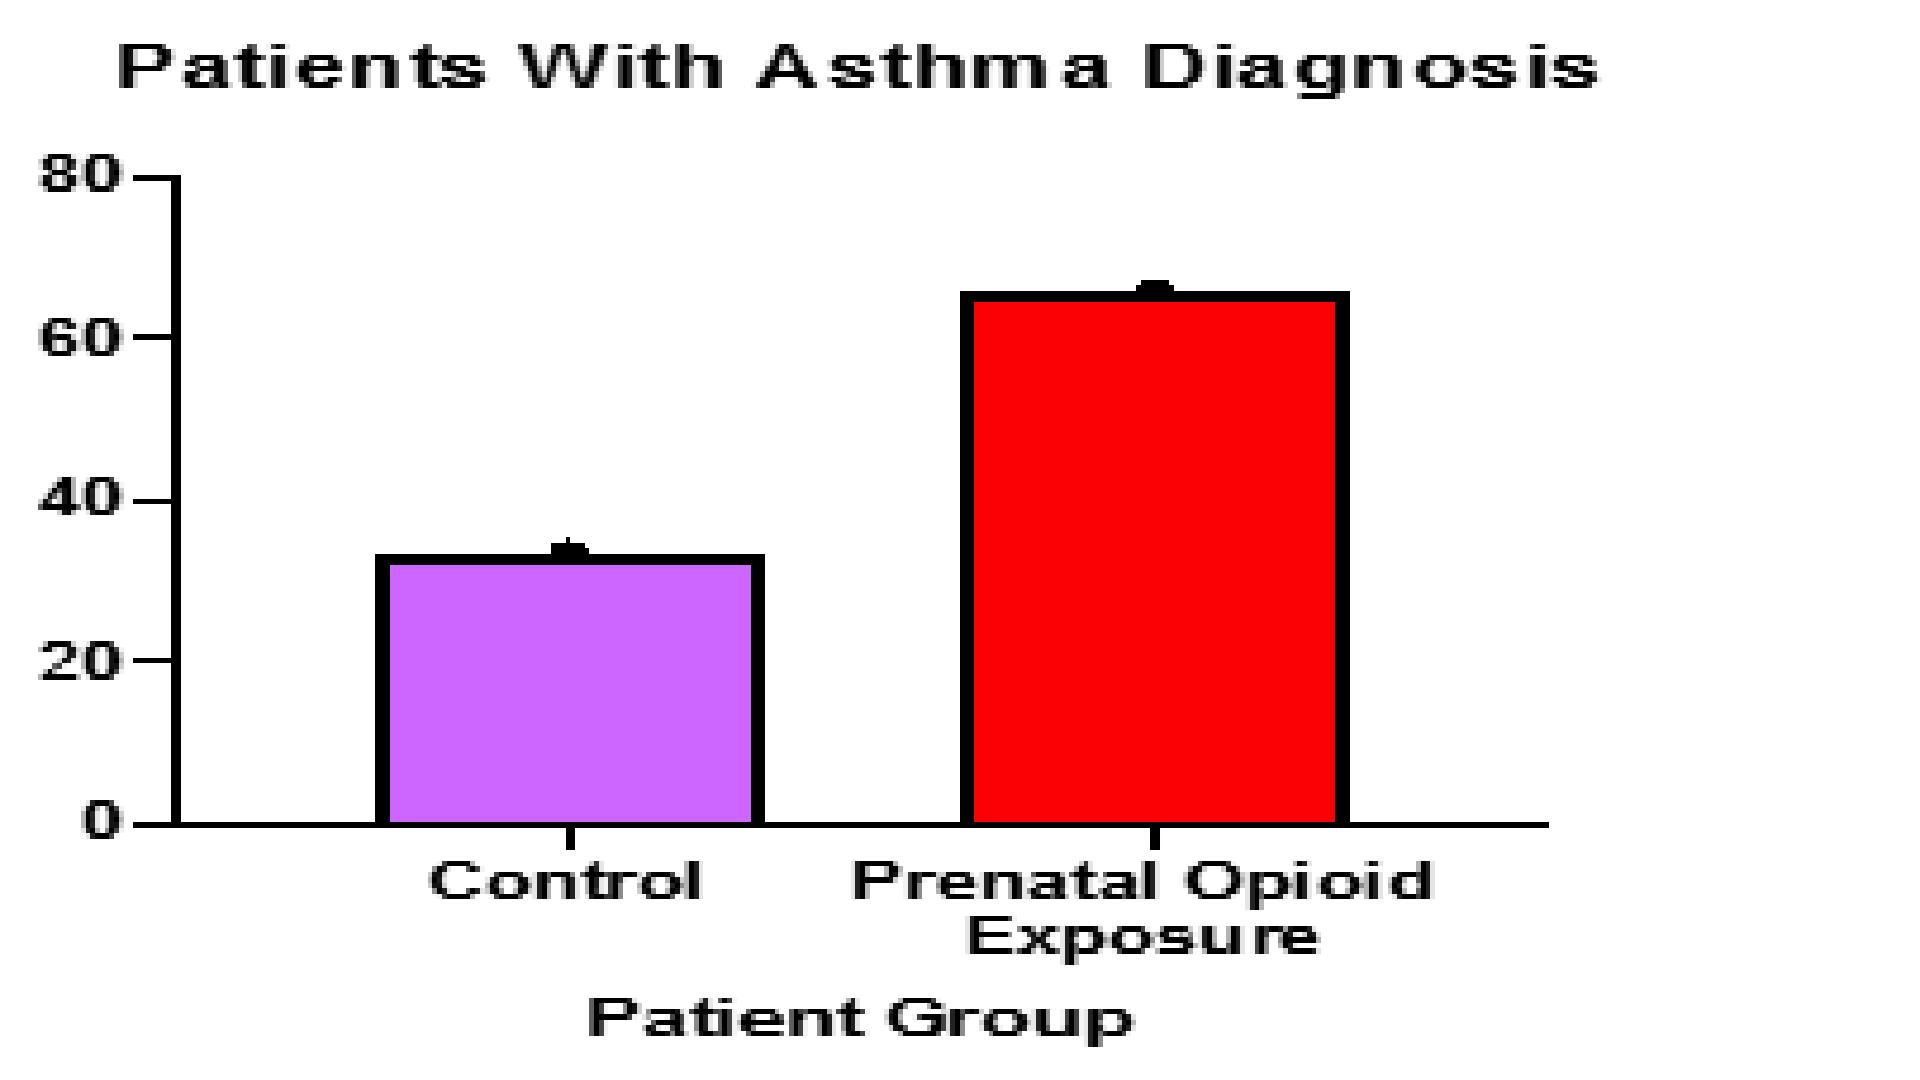 Increasing Incidence of Asthma in Children with Prenatal Opioid Exposure